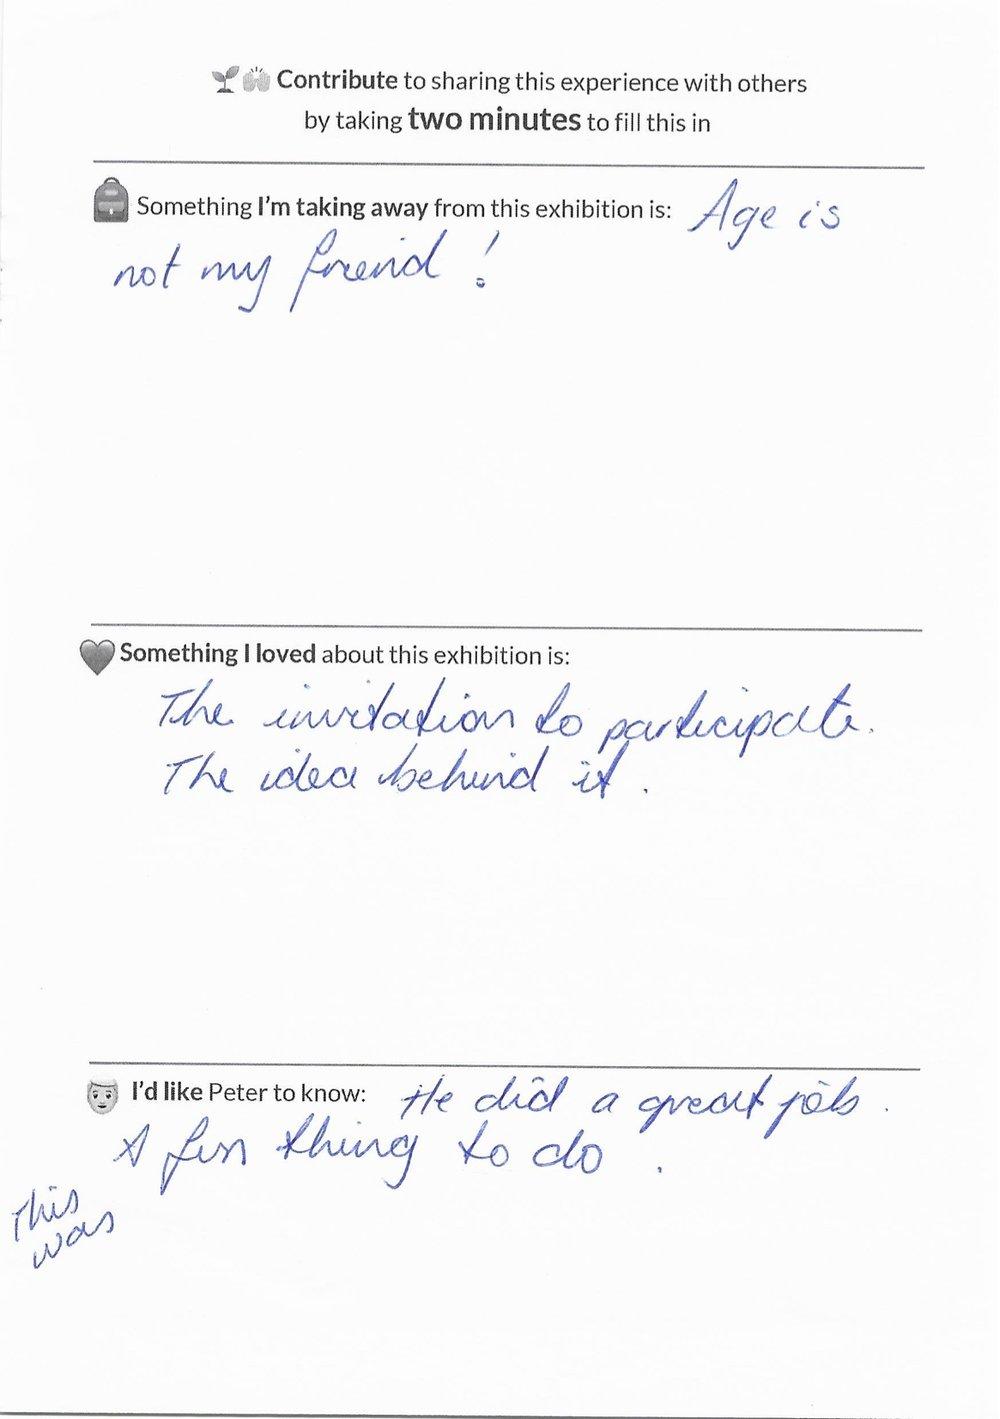 Drawn-in reflections-194.jpg